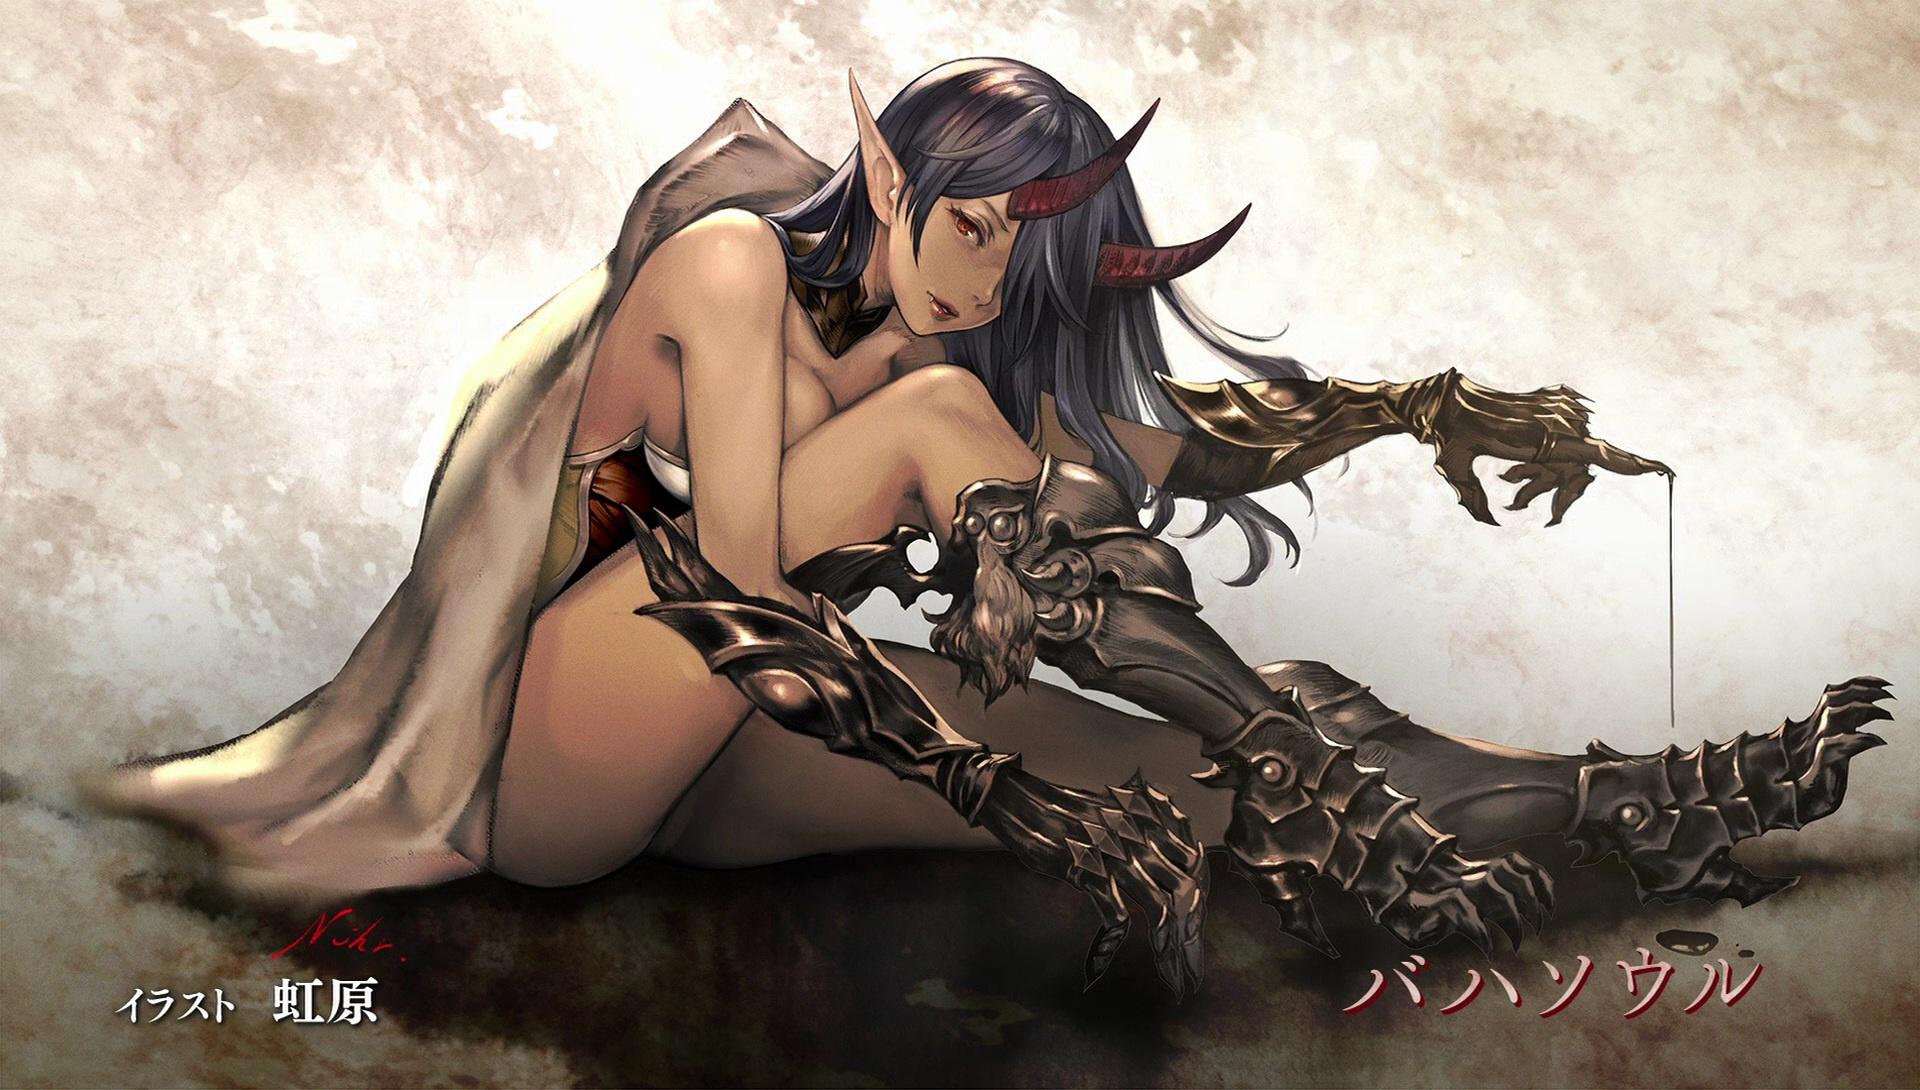 Erotic fantasy and hentai art hentay galleries